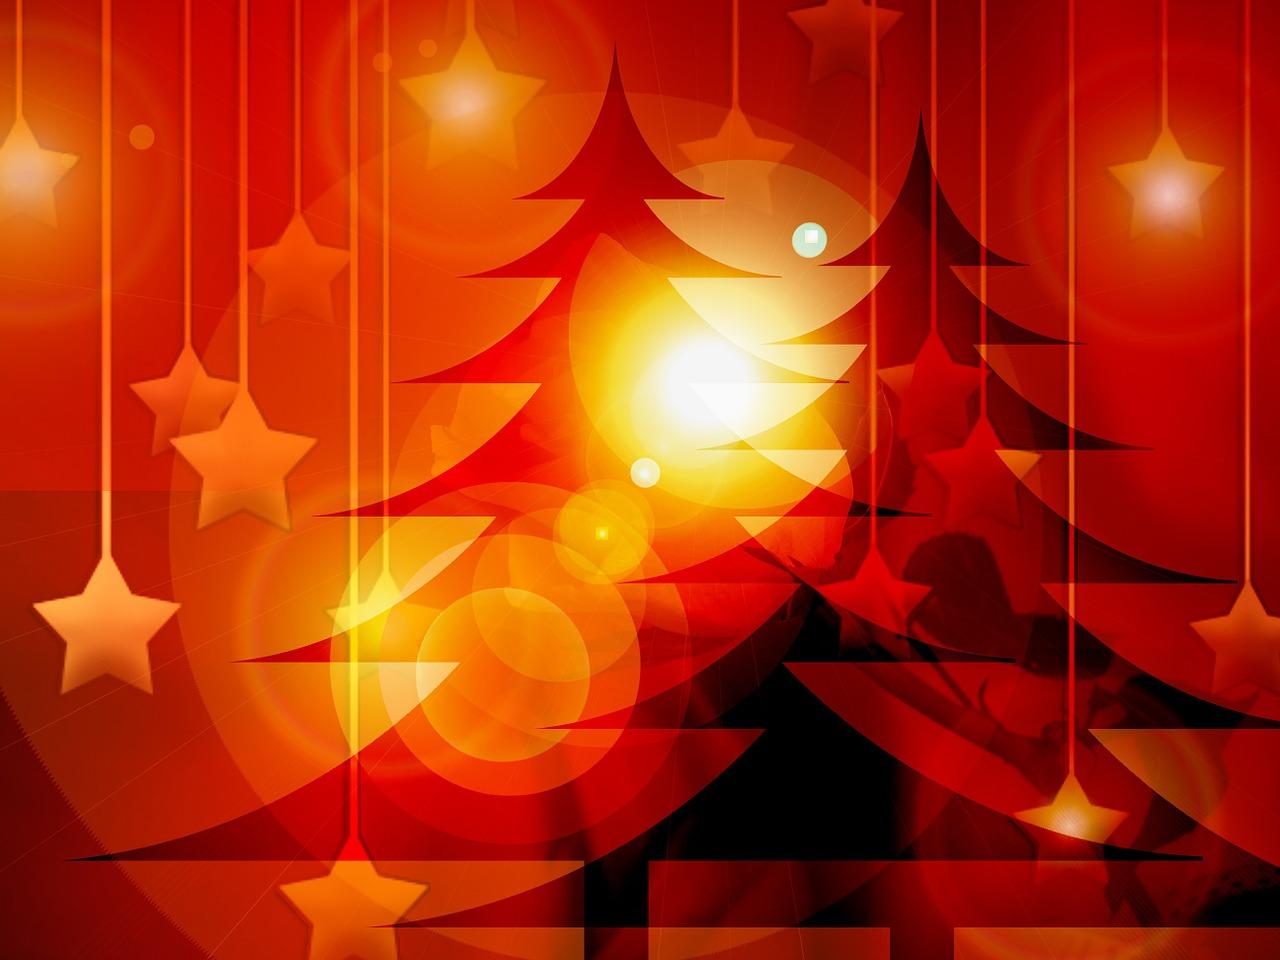 Christmas Image || Christmas Images Free || Christmas Image Download || Merry Christmas Image